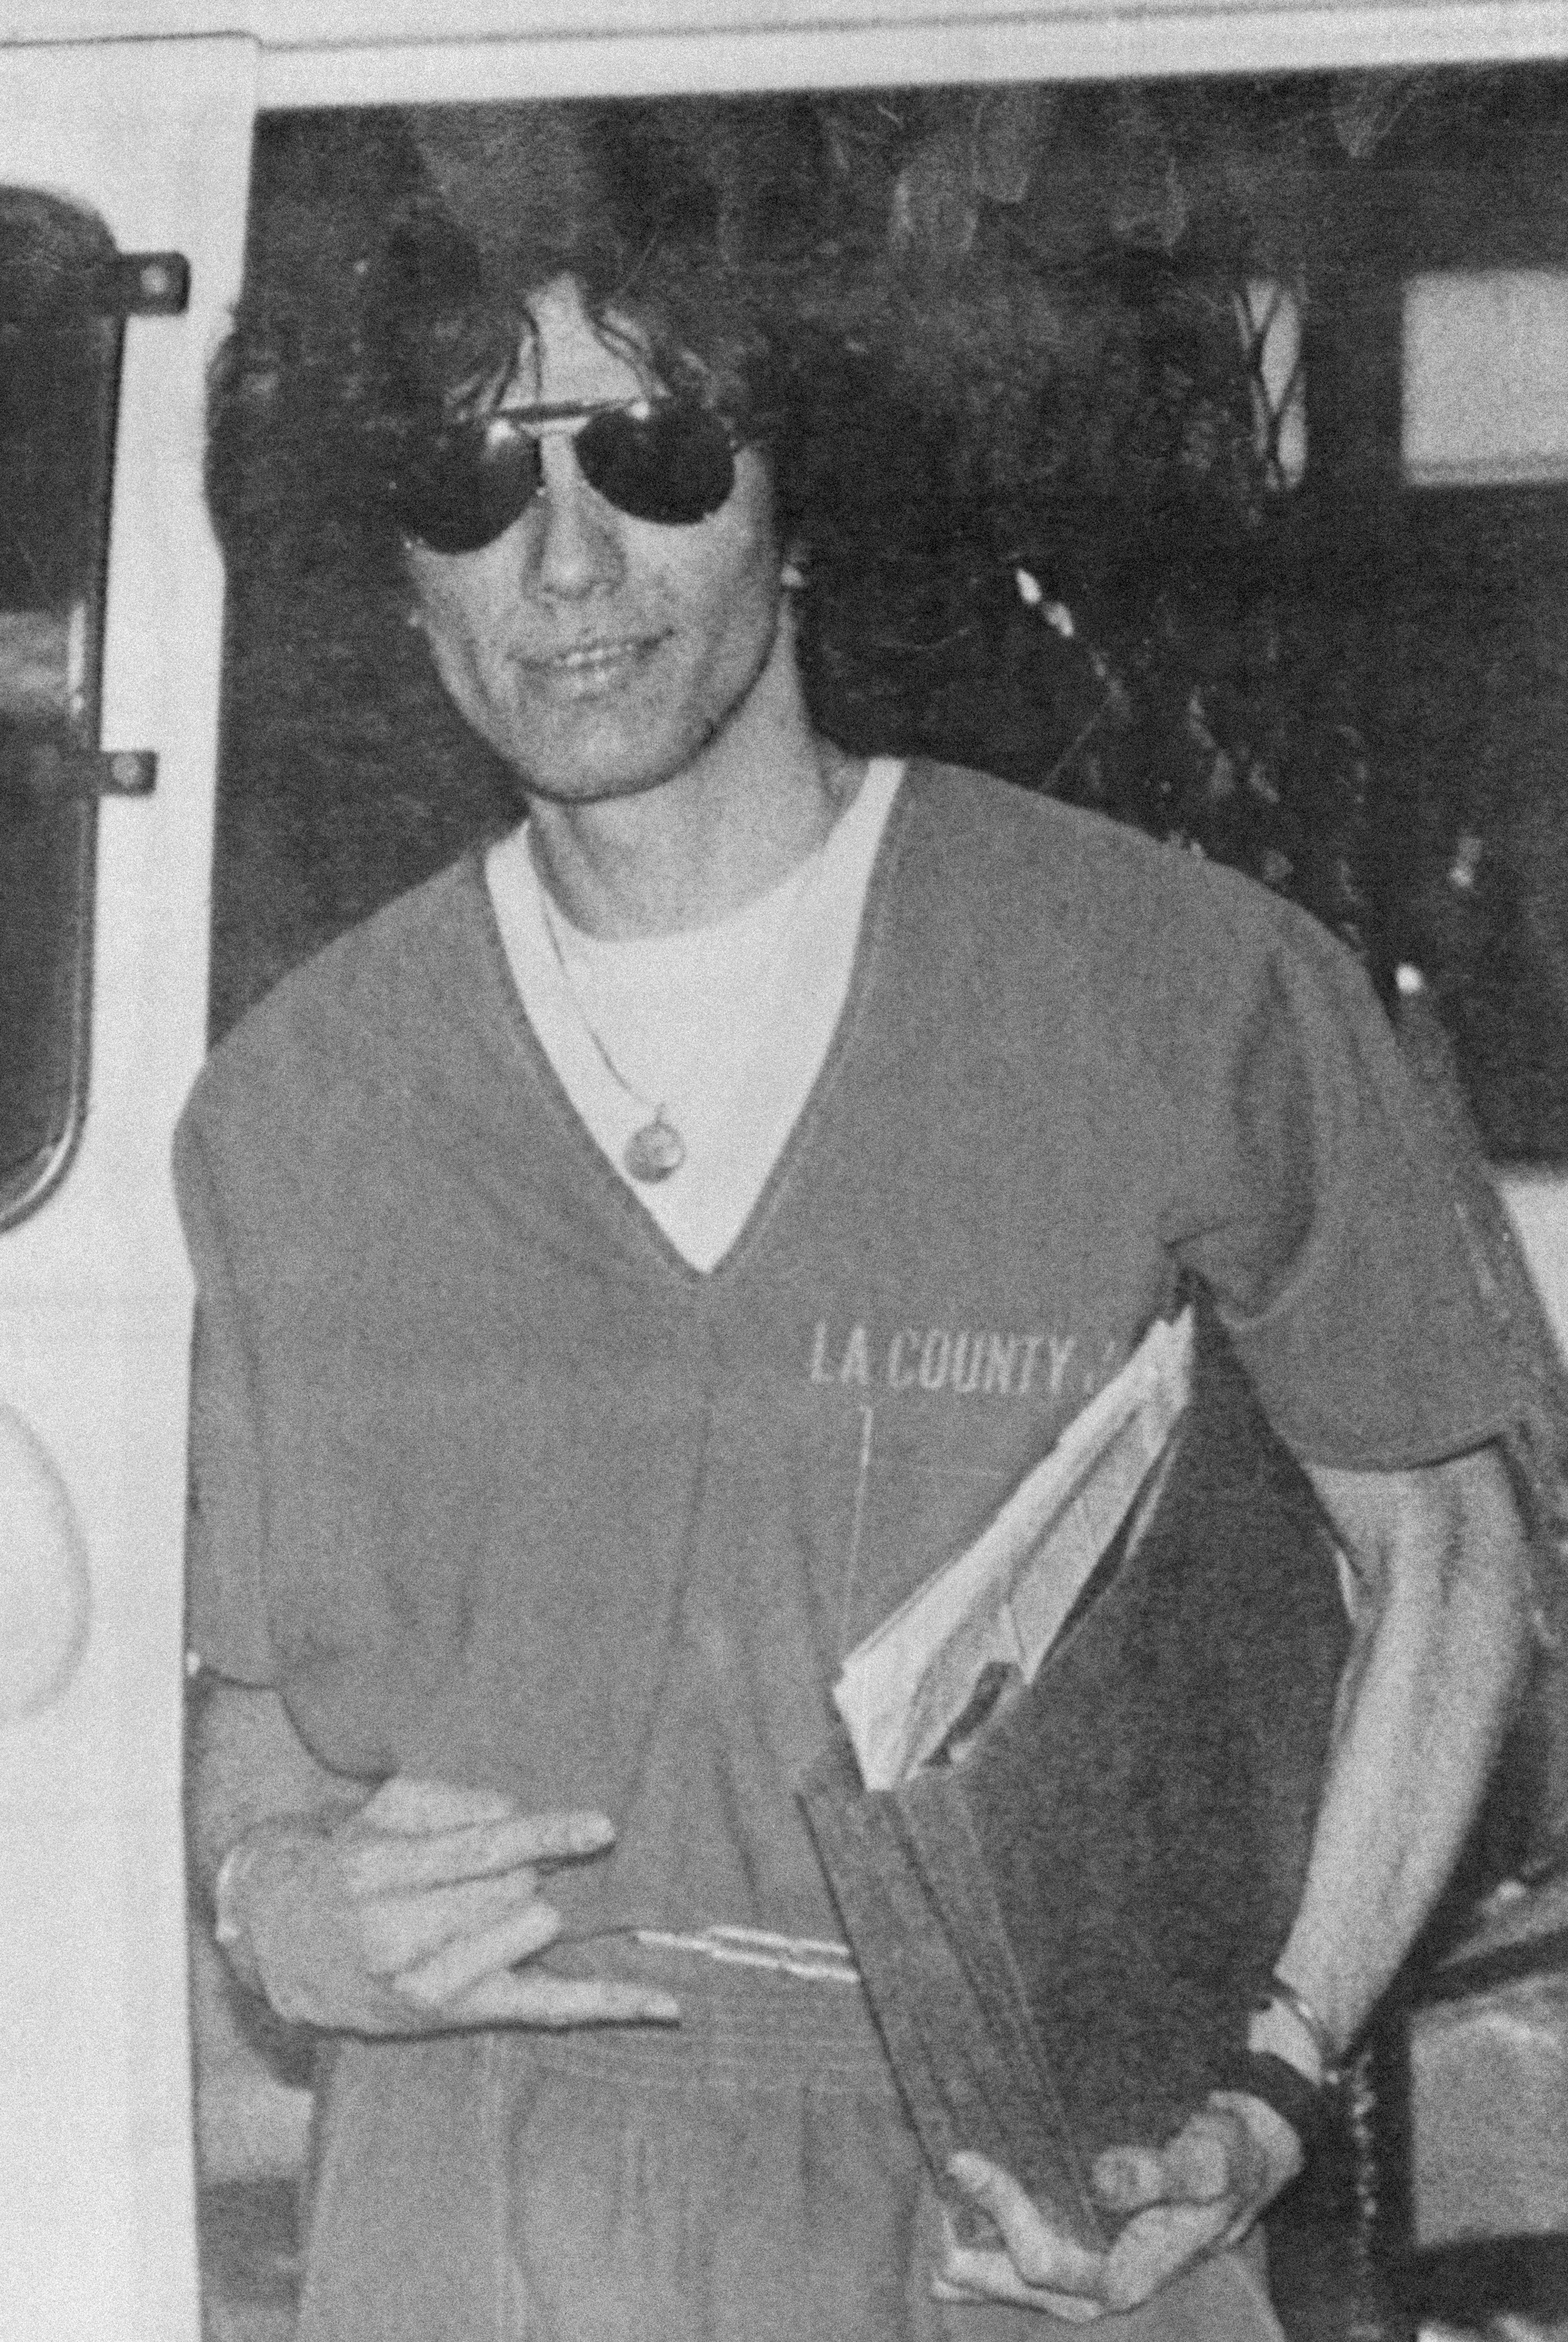 Black-and-white photo of Richard Ramirez in LA County jail